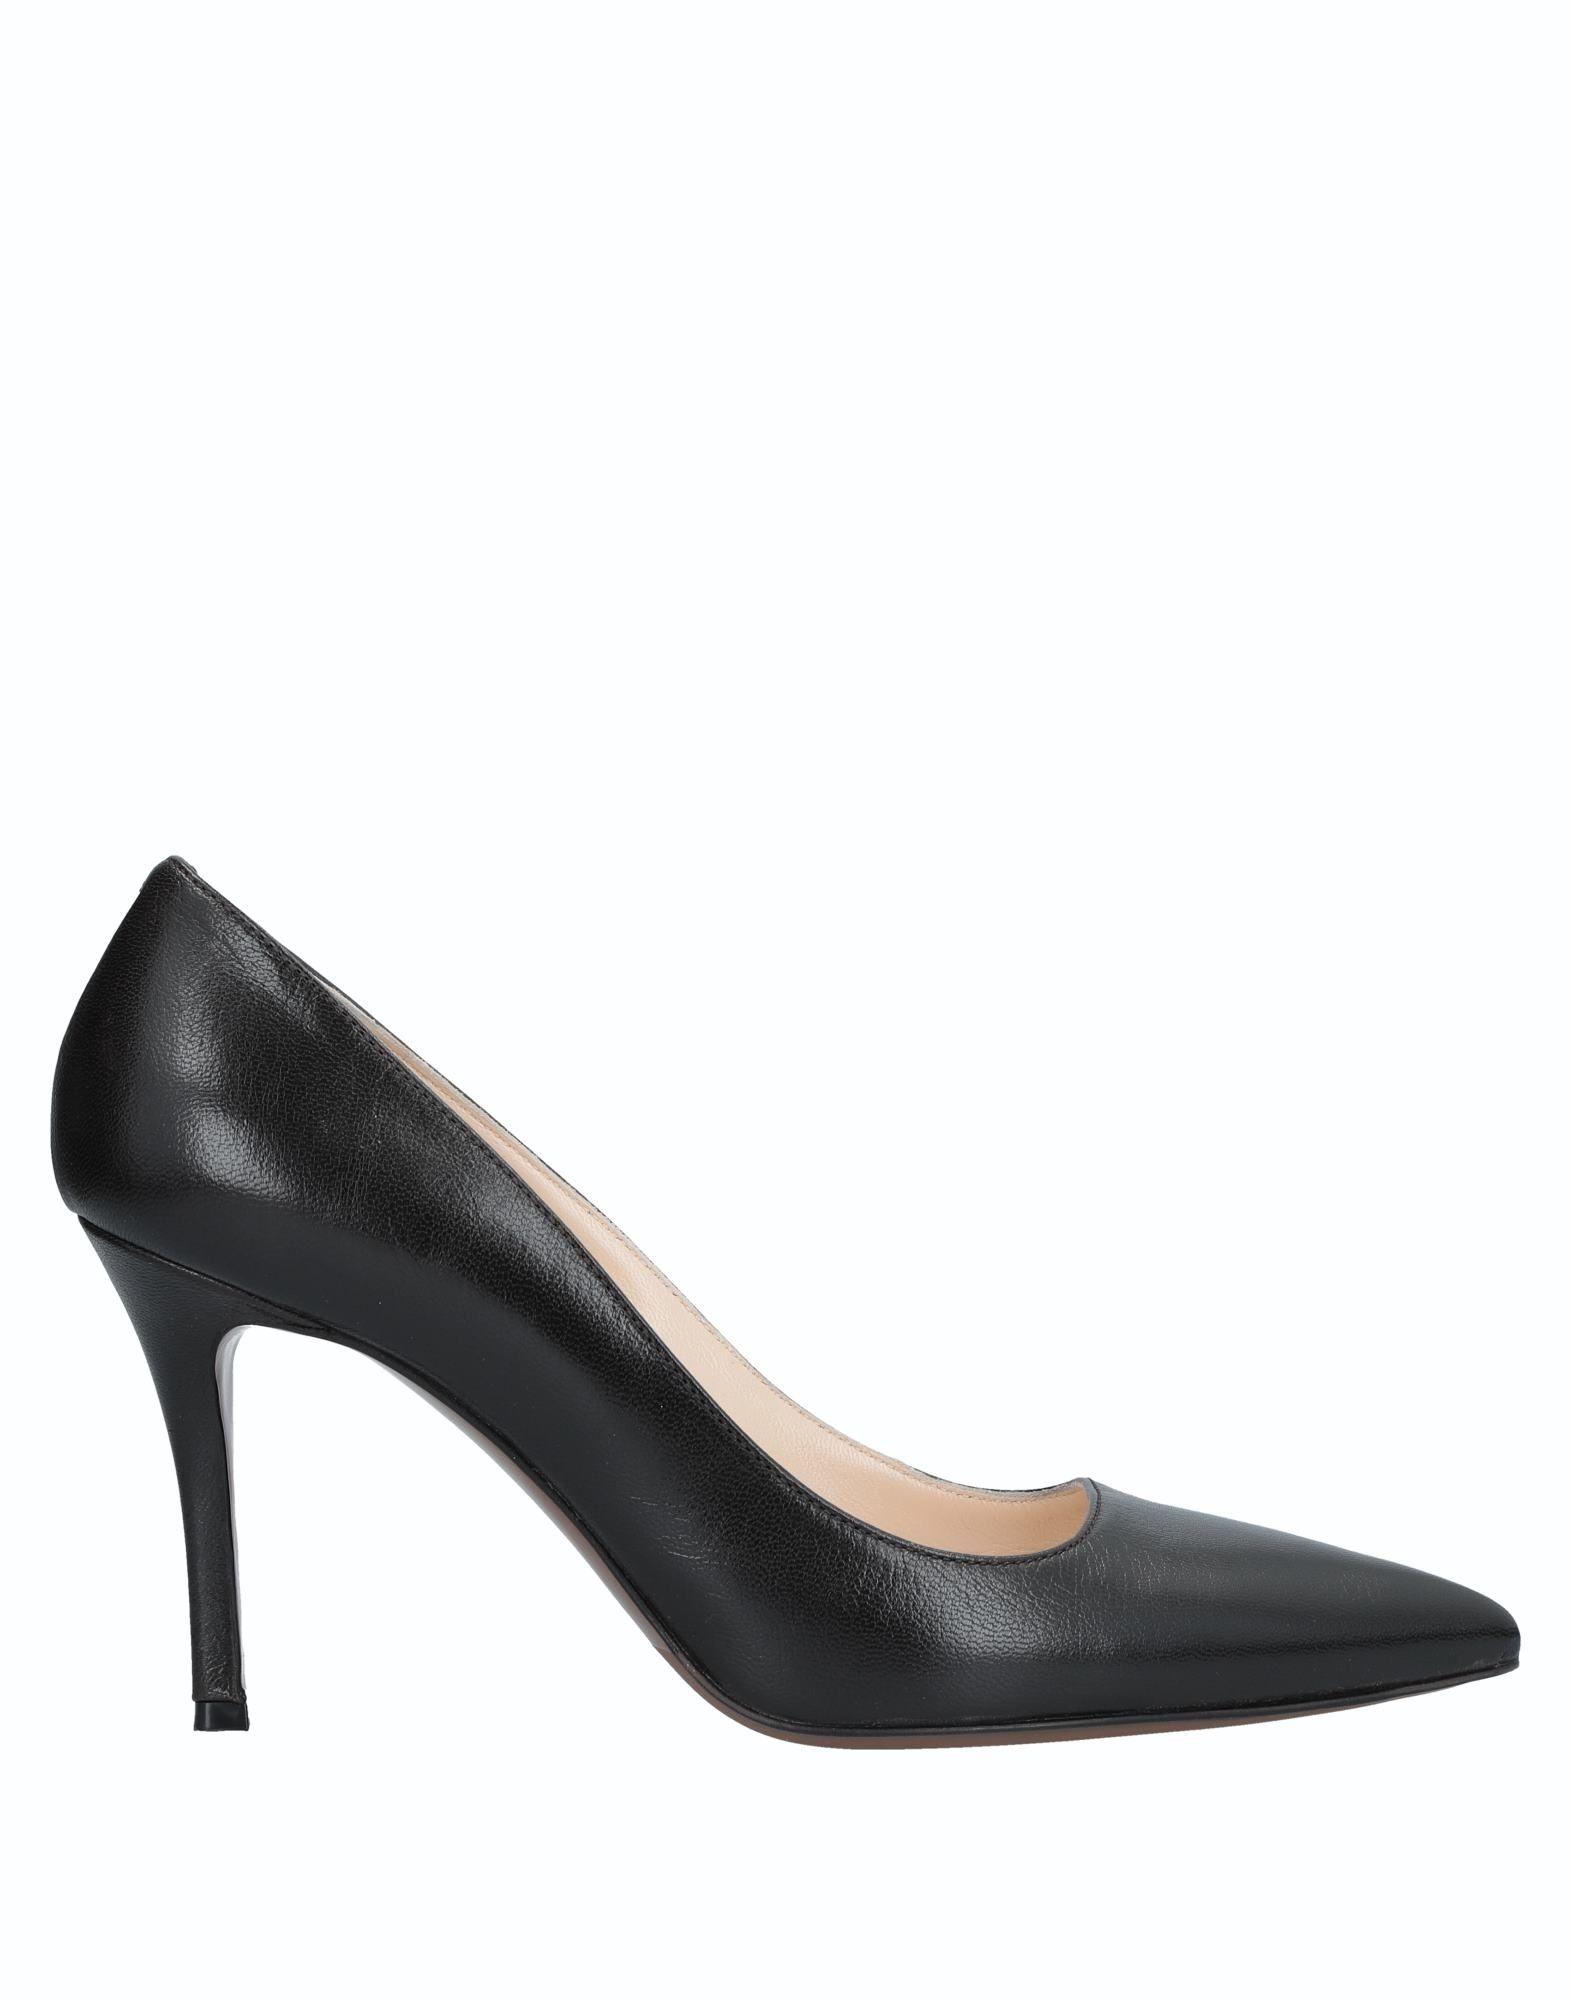 Moda barata y hermosa Zapato De Salón L' Autre Chose Mujer Mujer Chose - Salones L' Autre Chose  Negro f5c69b